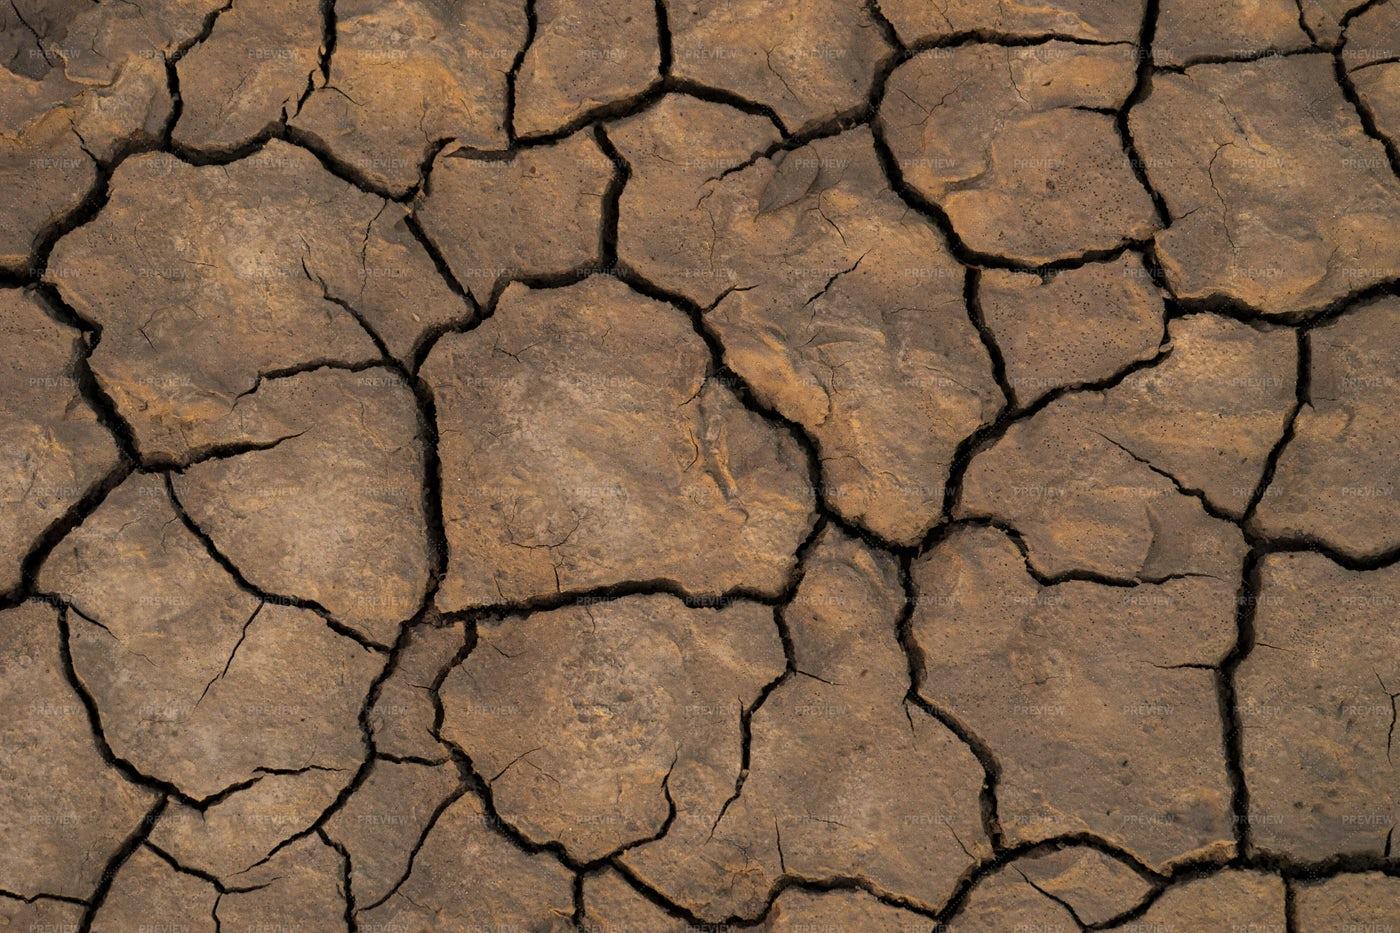 Cracked Textured Soil: Stock Photos